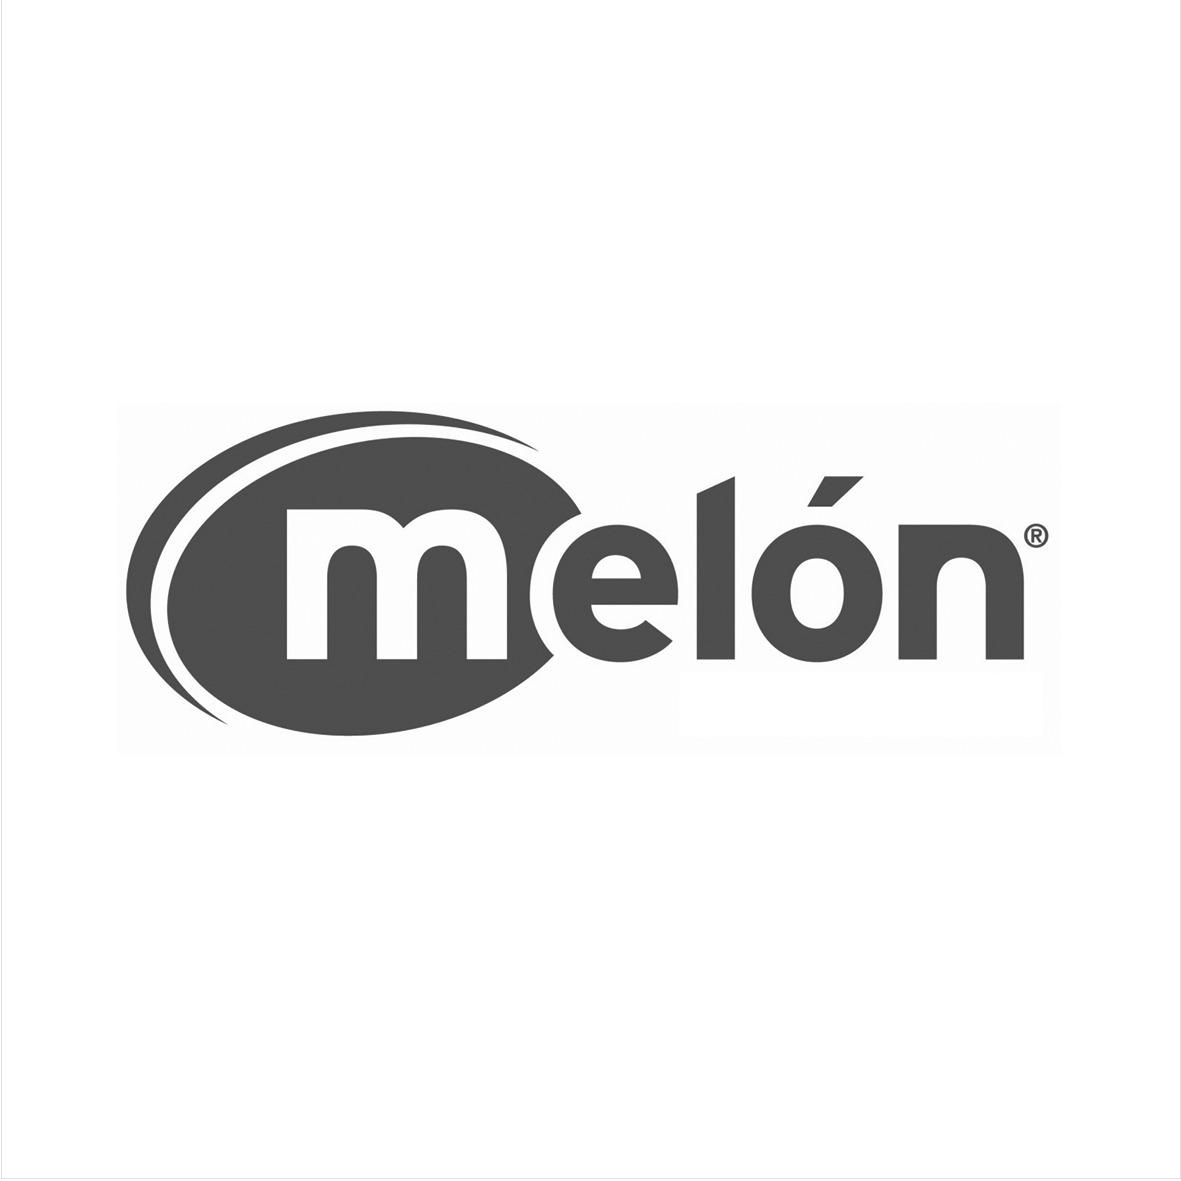 MELON_edited